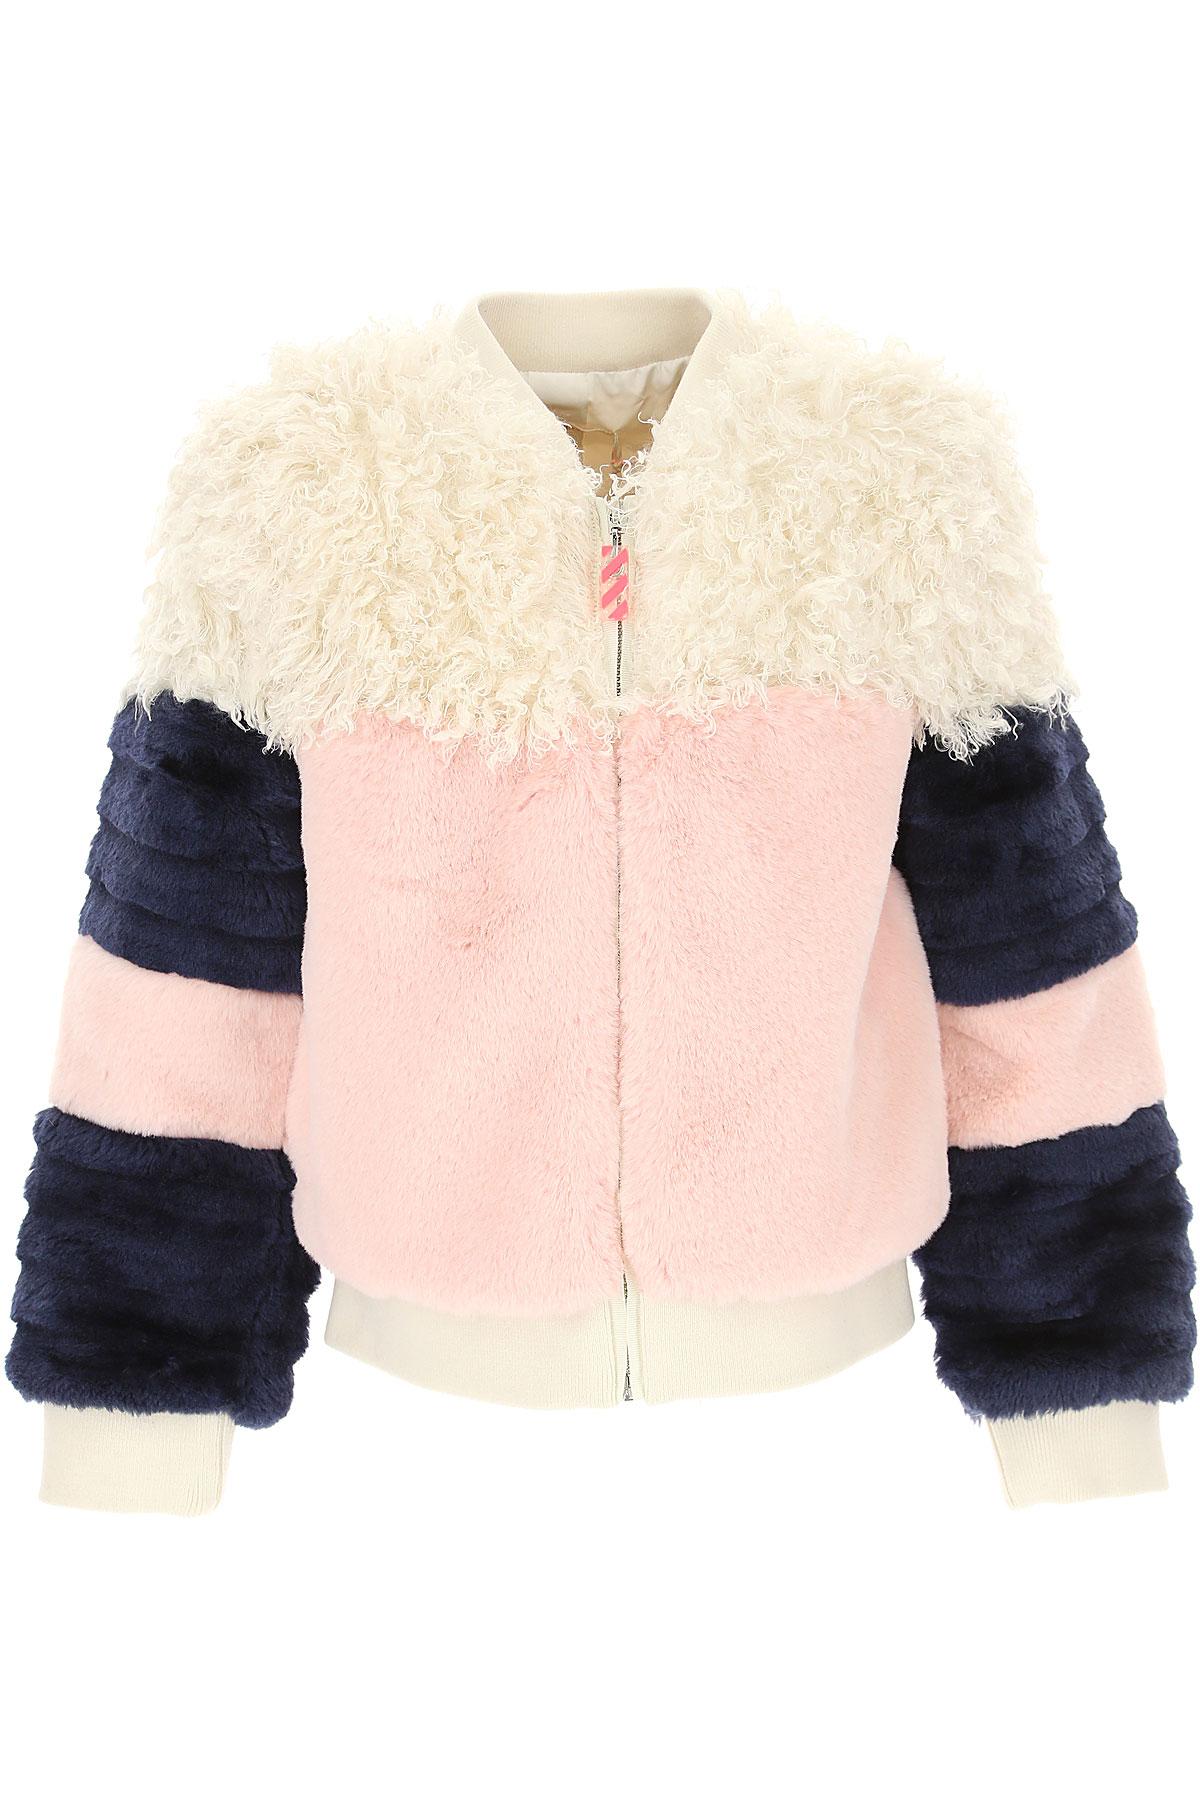 Image of Billieblush Kids Jacket for Girls, Baby Pink, polyester, 2017, 10Y 4Y 5Y 6Y 8Y